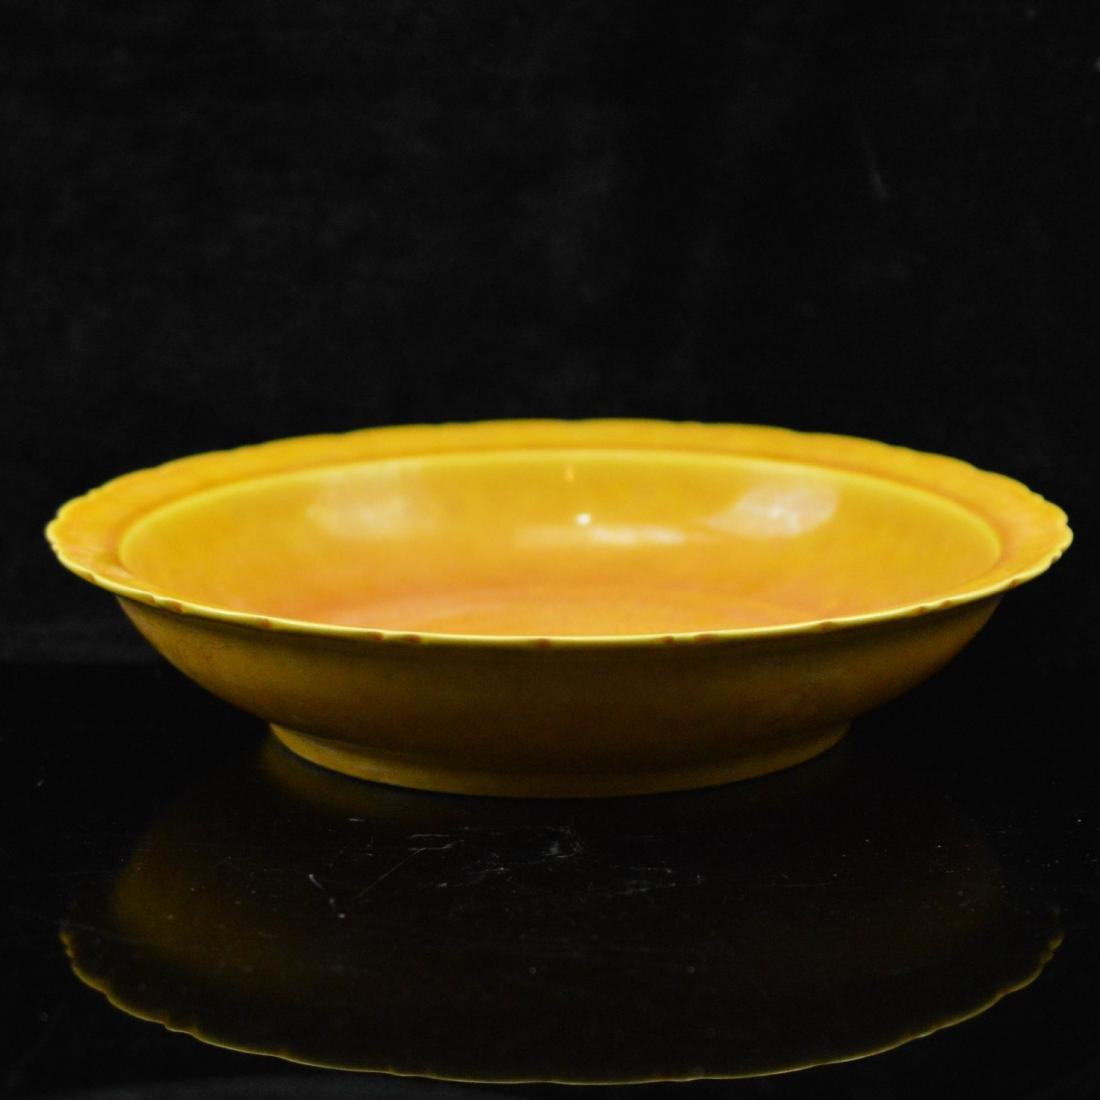 yellow underglazed porcelain plate